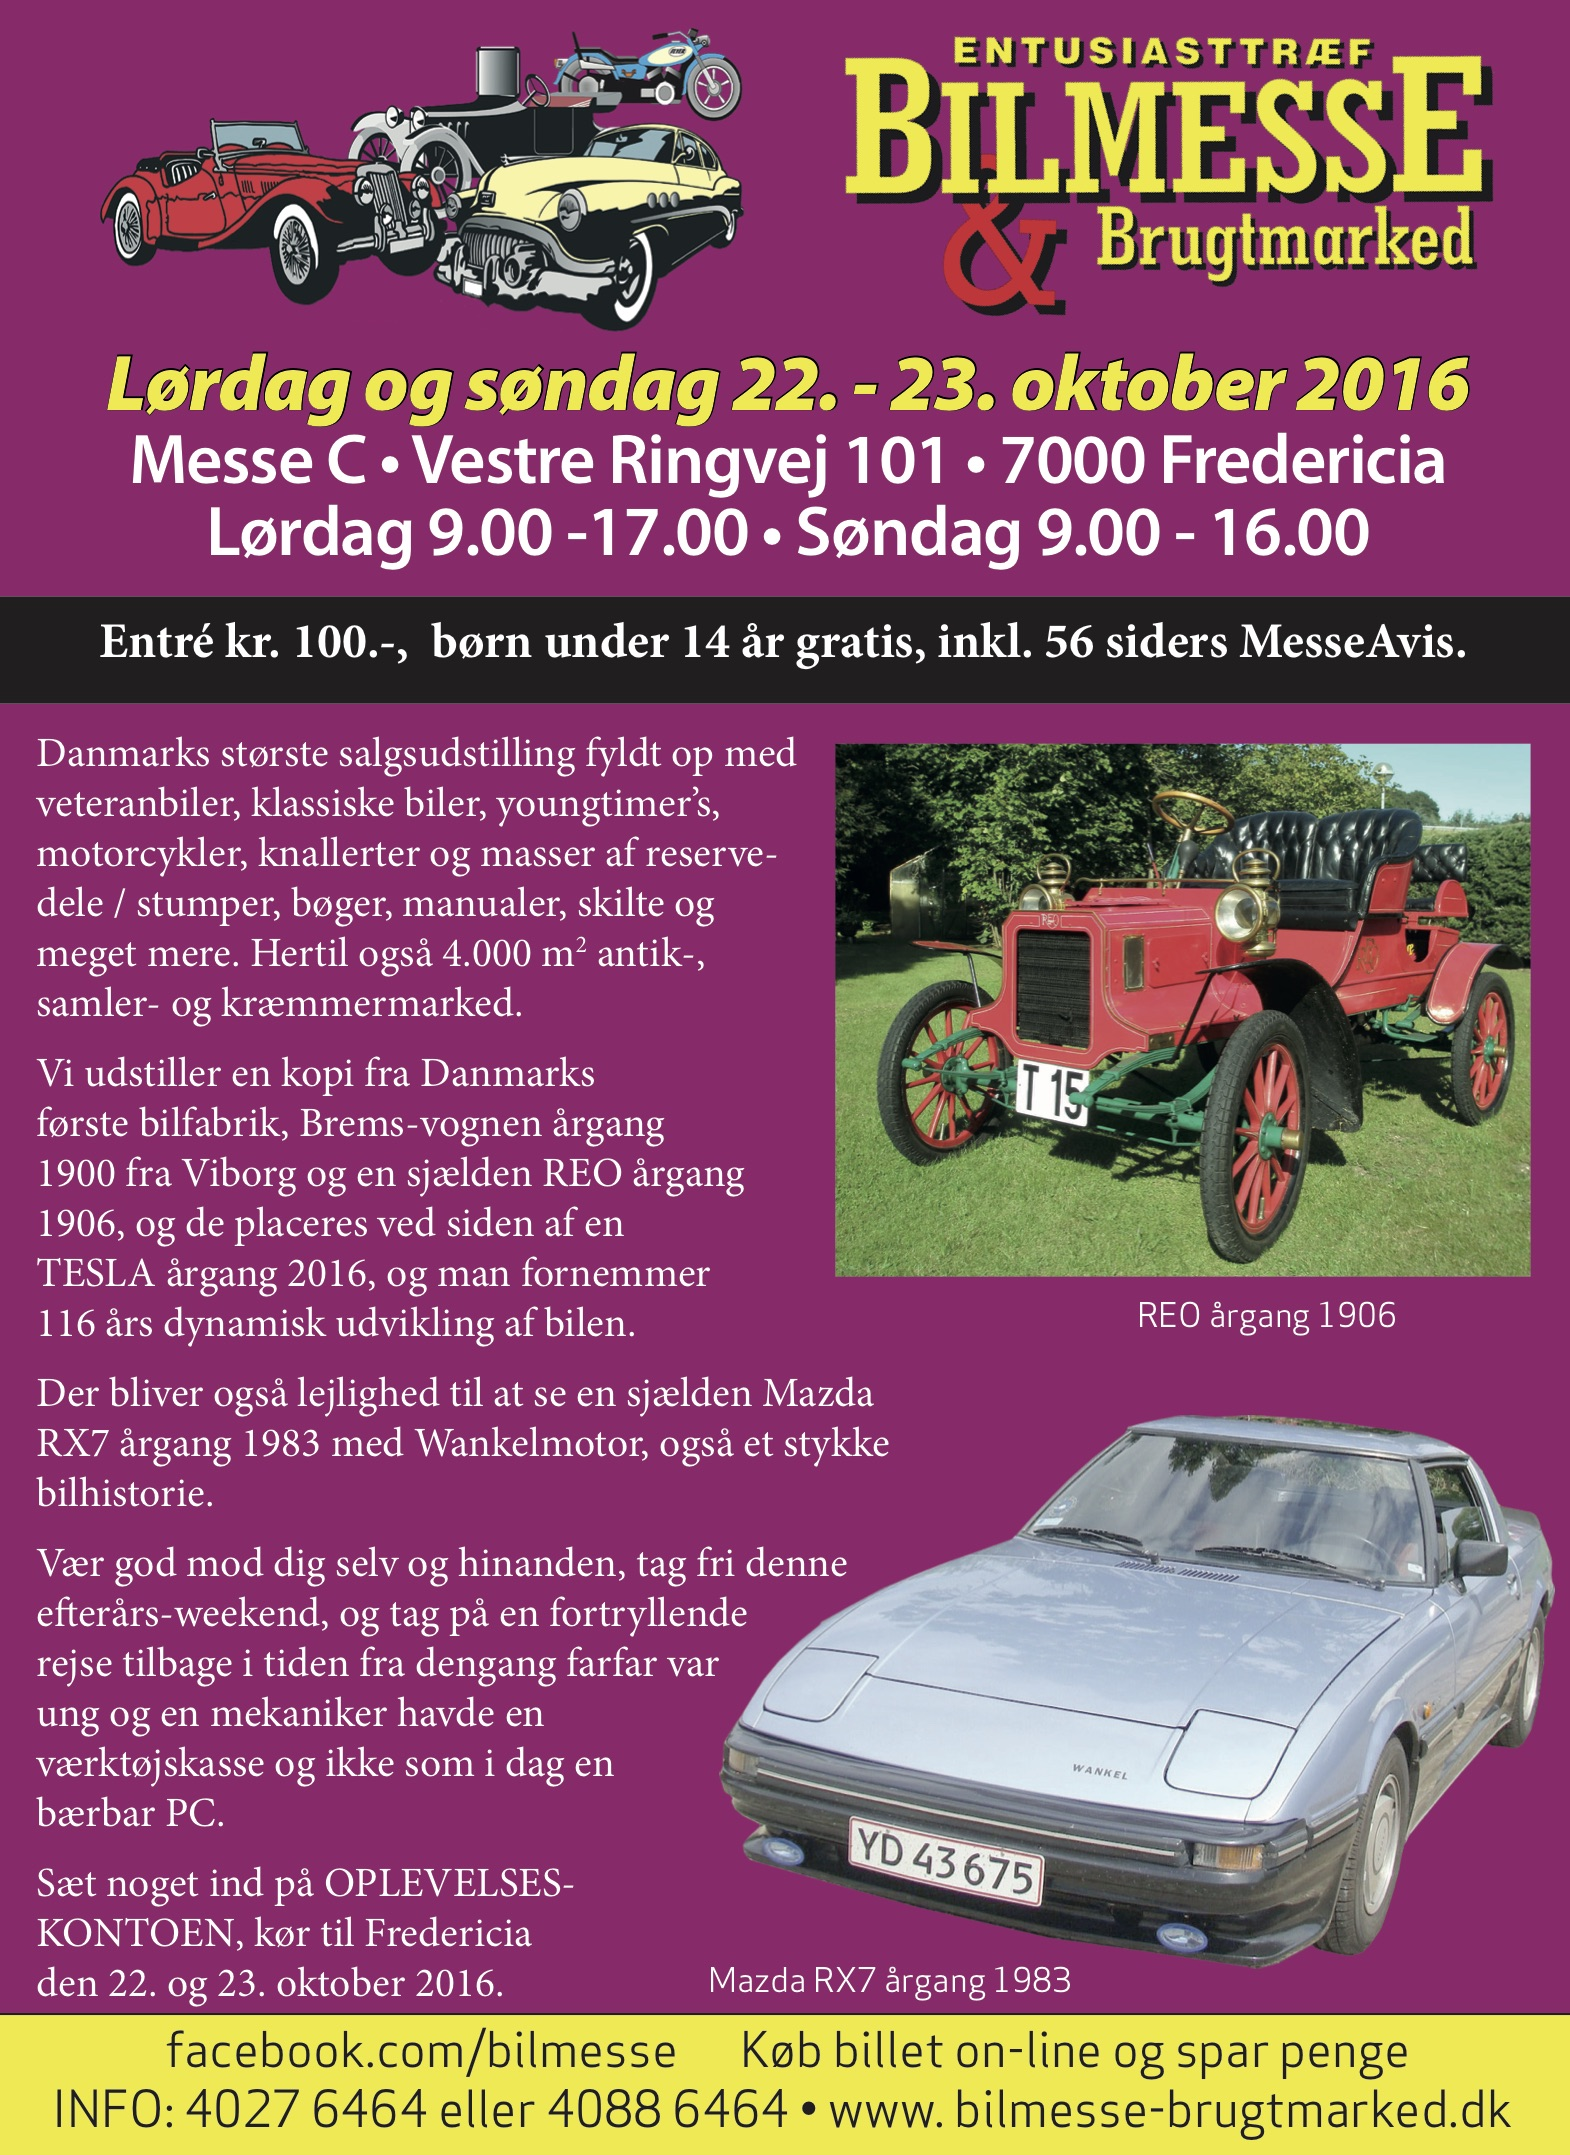 BilMesse & Brugtmarked oktober 2016